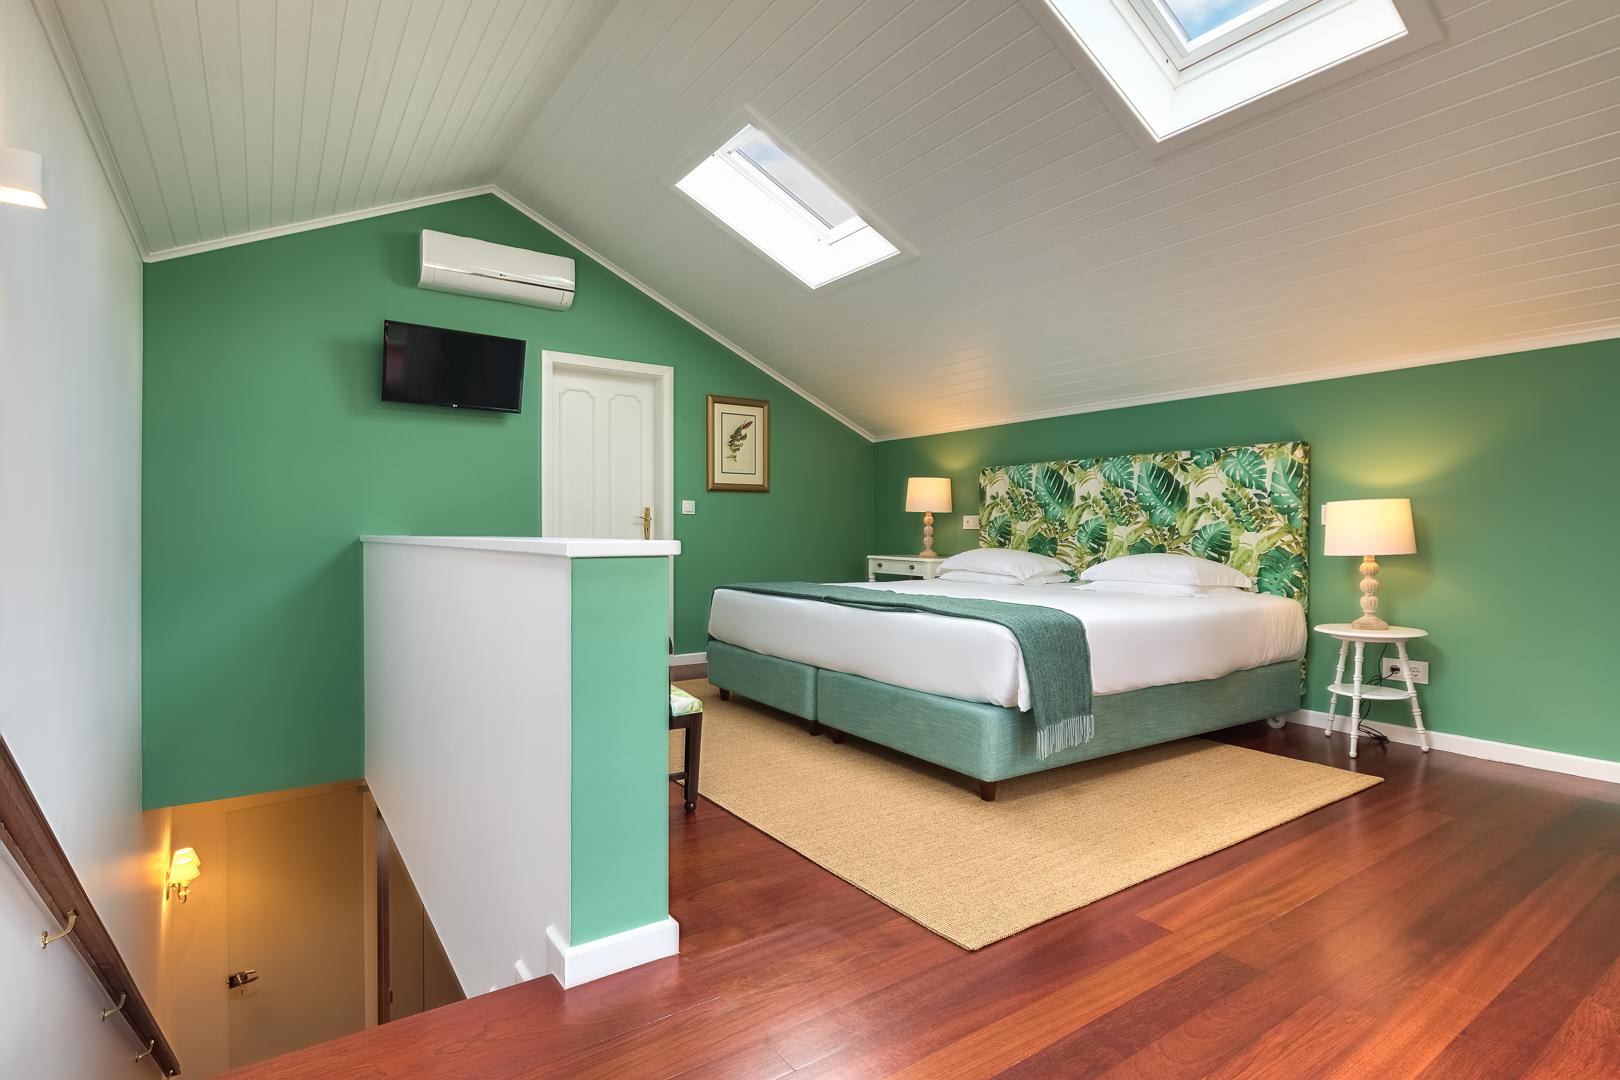 HOTEL_QUINTA_JARDINS_DO_LAGO_DIA_2_15022018_MG_7165_1090.jpg